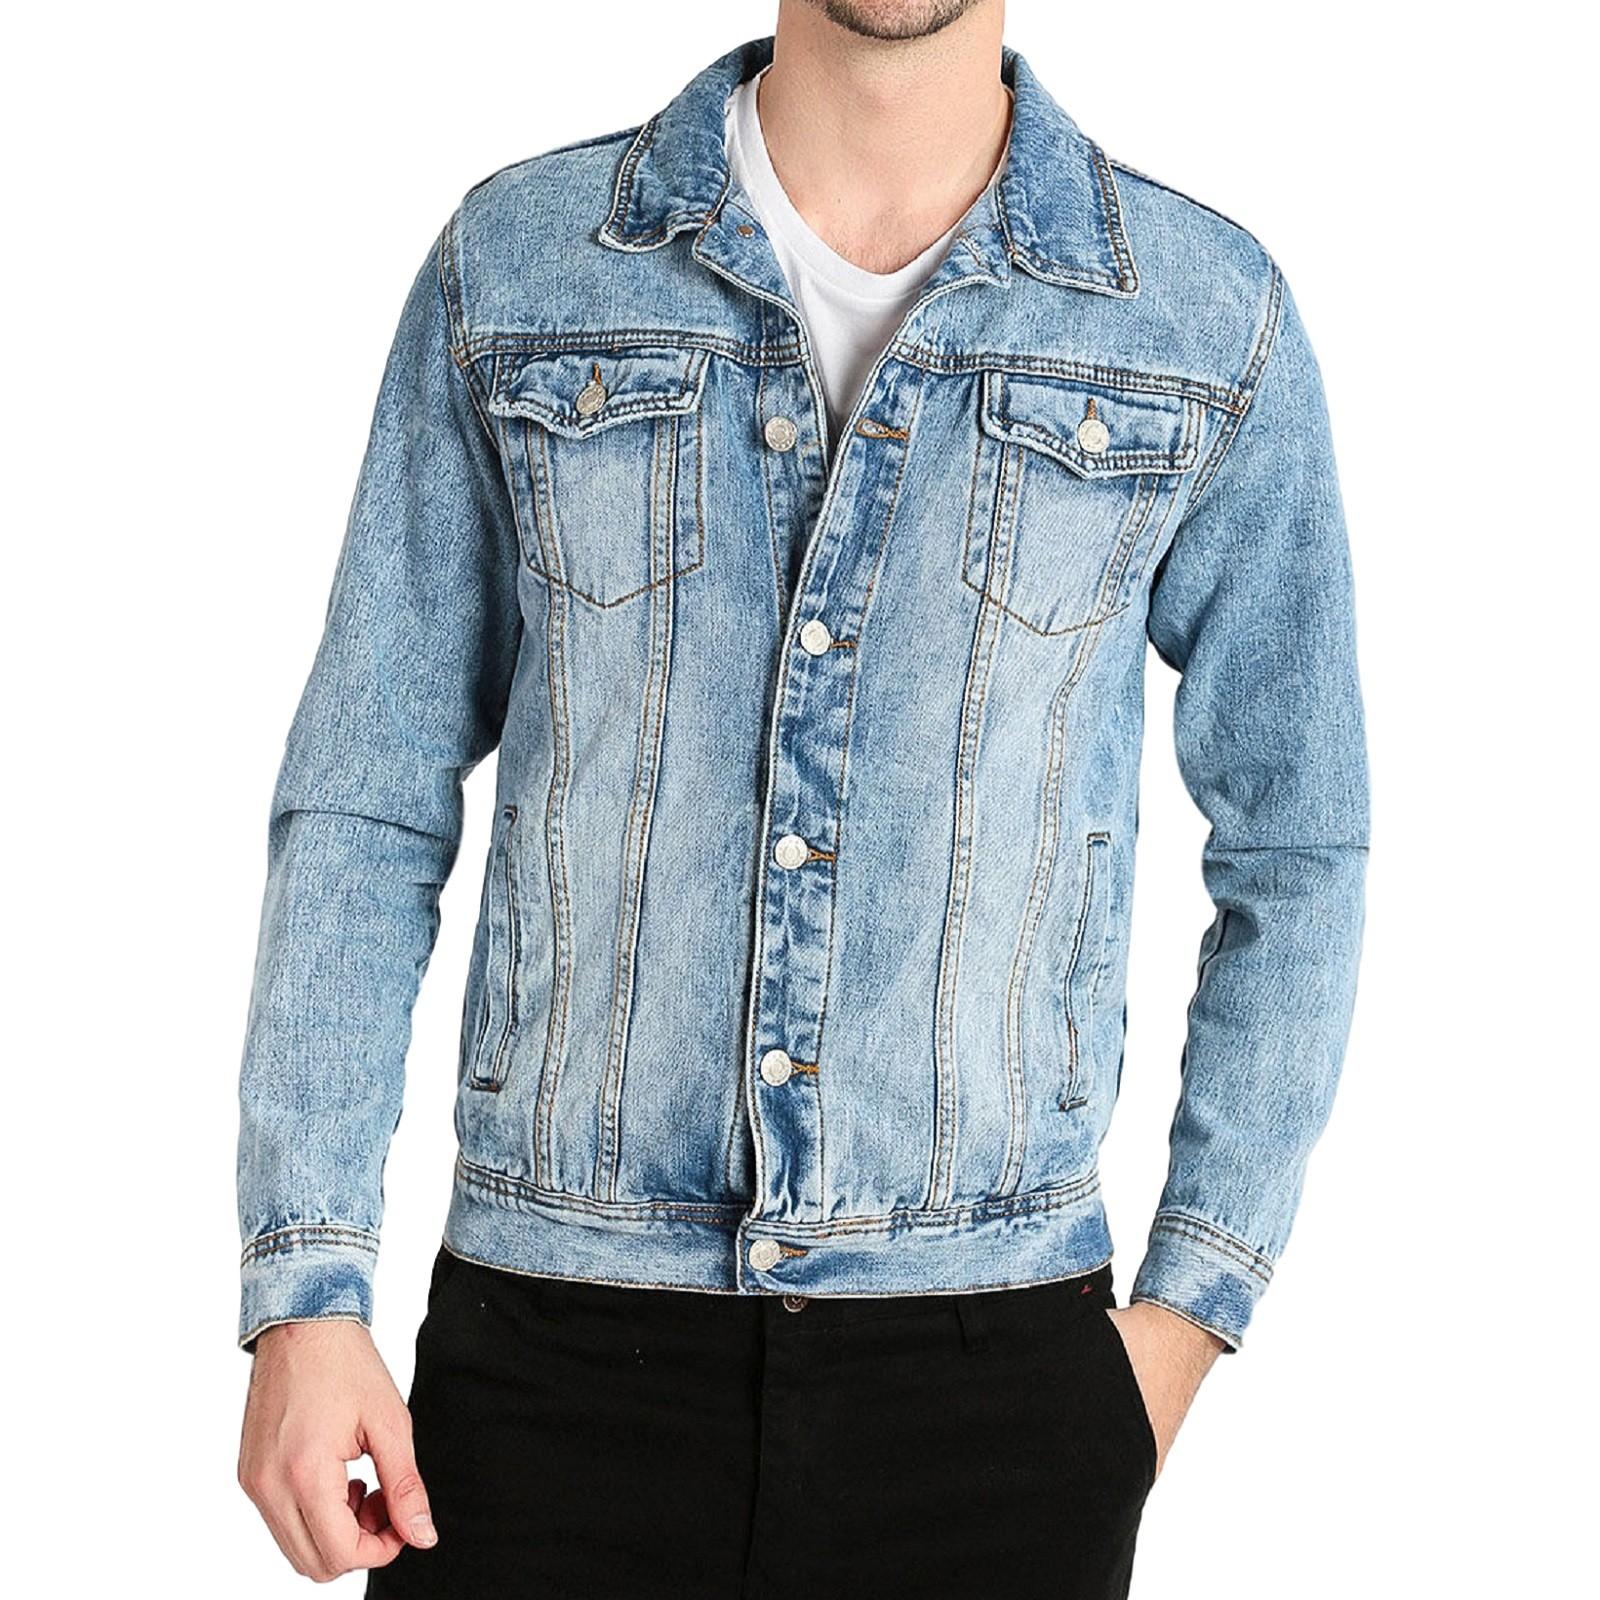 Giubbino-Jeans-Uomo-Giacca-Denim-Casual-Giacca-Slim-Fit-Blu-Chiaro miniatura 10